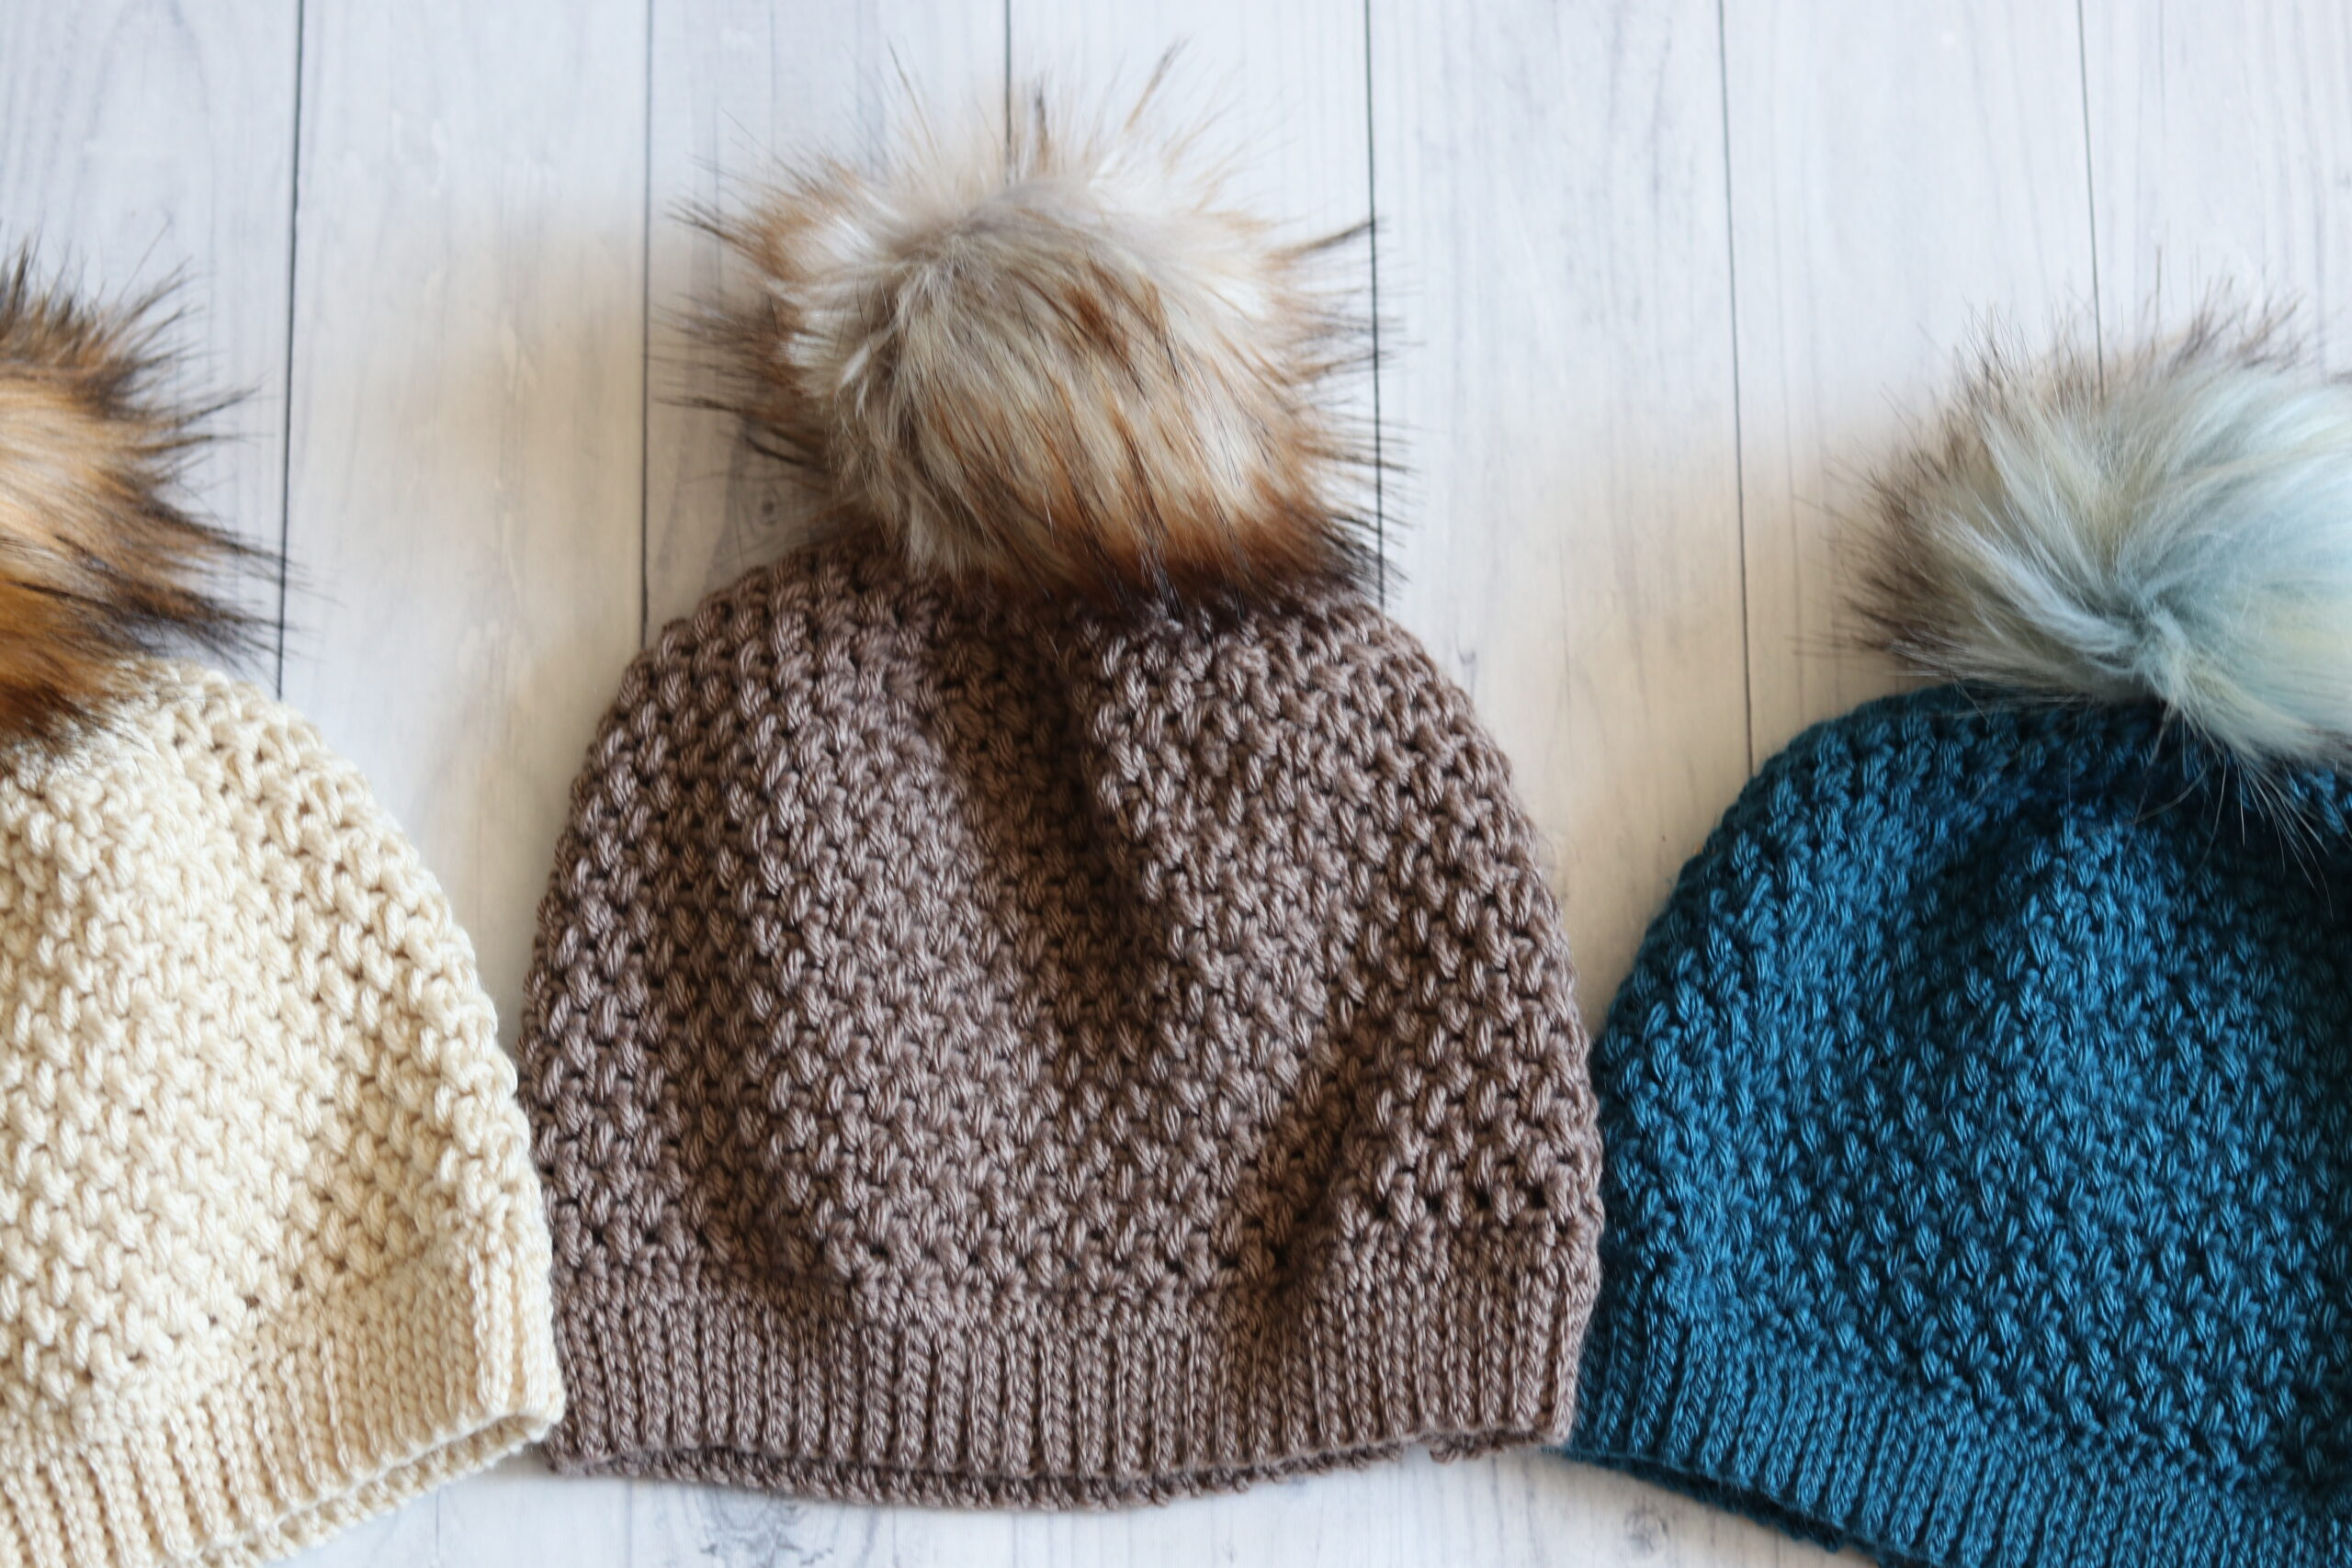 Textured crochet beanie